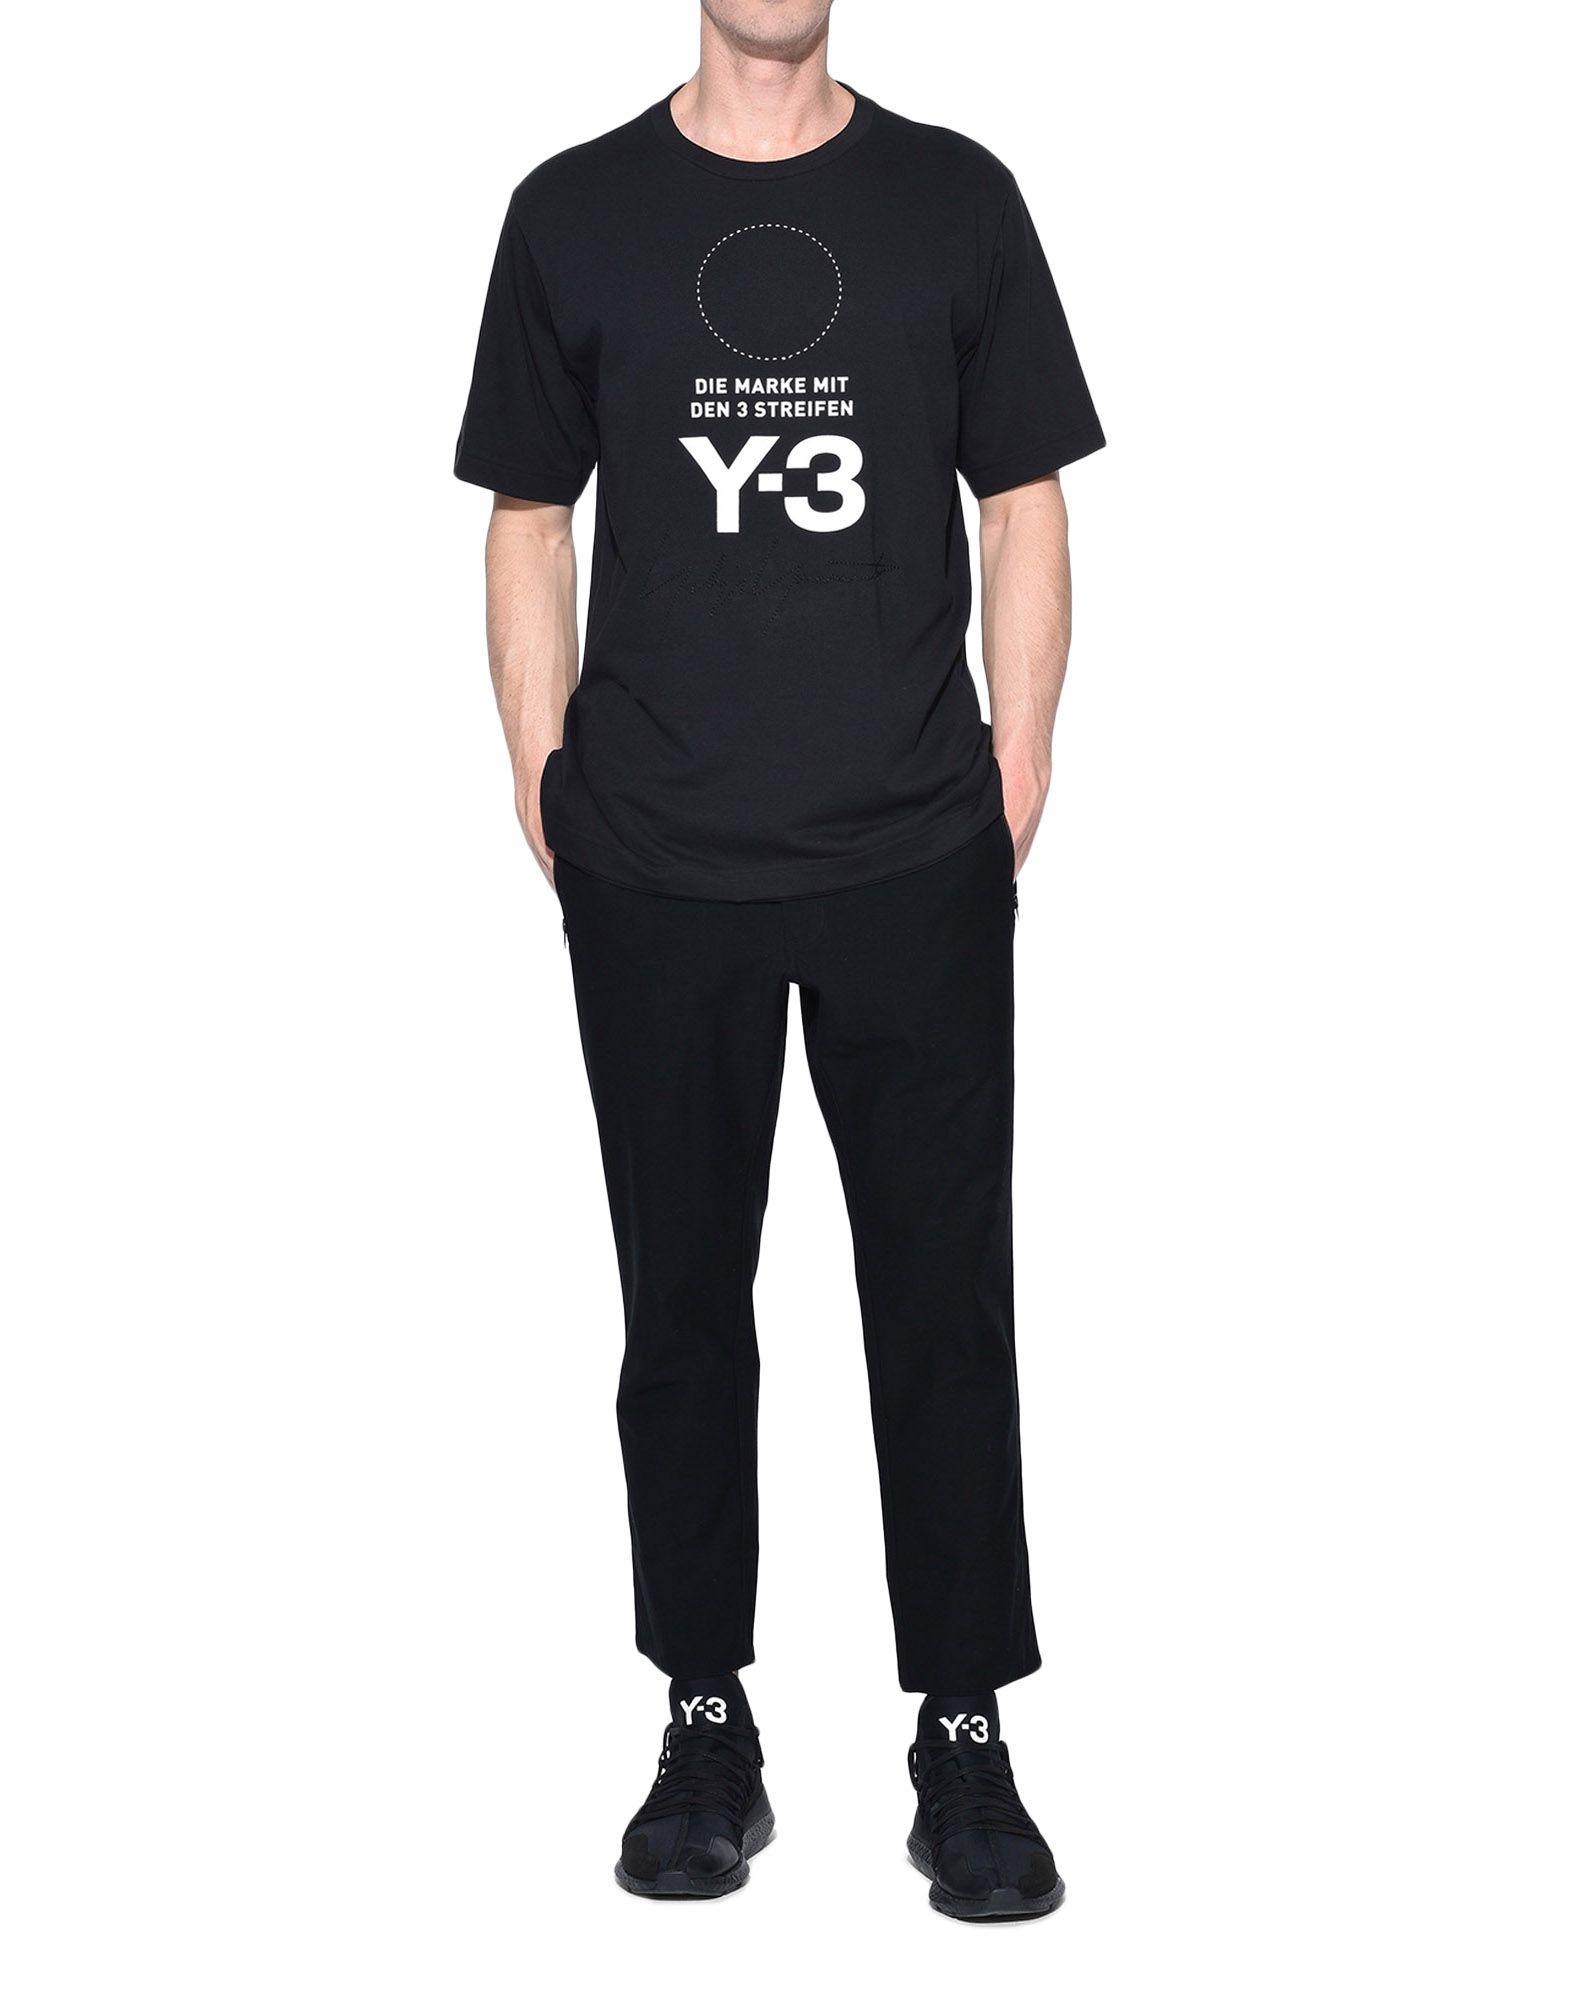 Y-3 Y-3 Twill Cropped Pants Hose Herren a